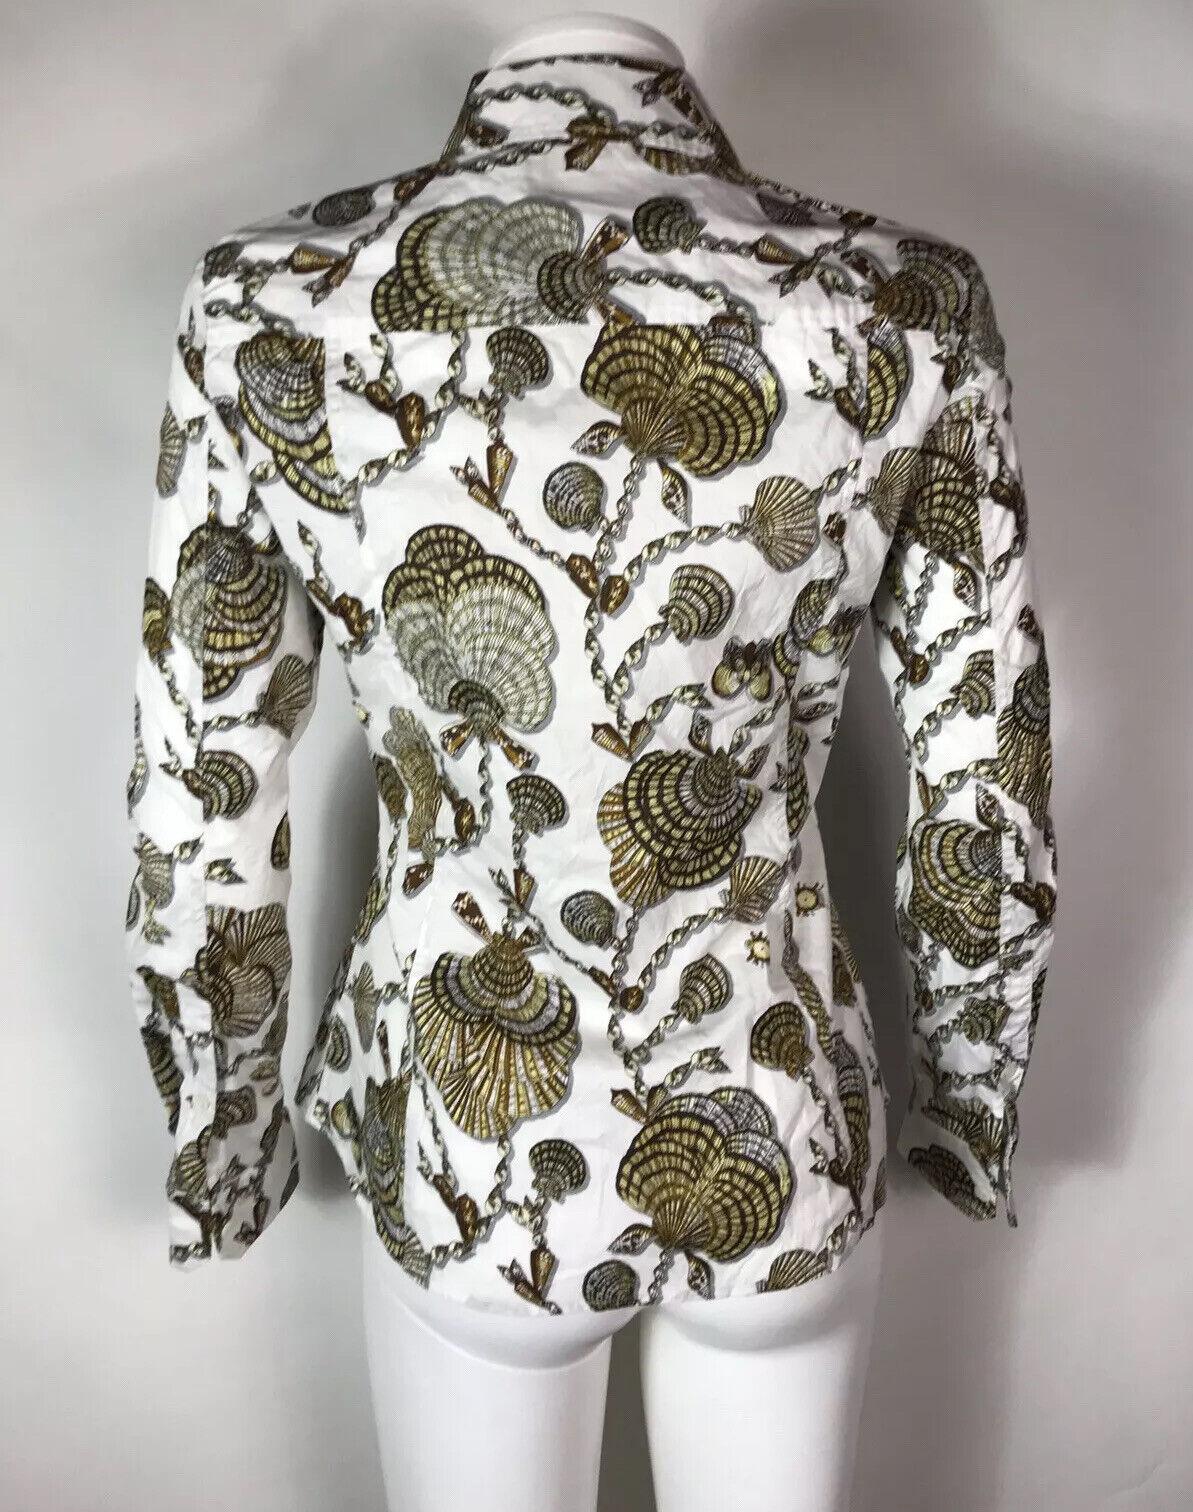 Rare Vtg Gucci White Seashell Print Top S - image 6